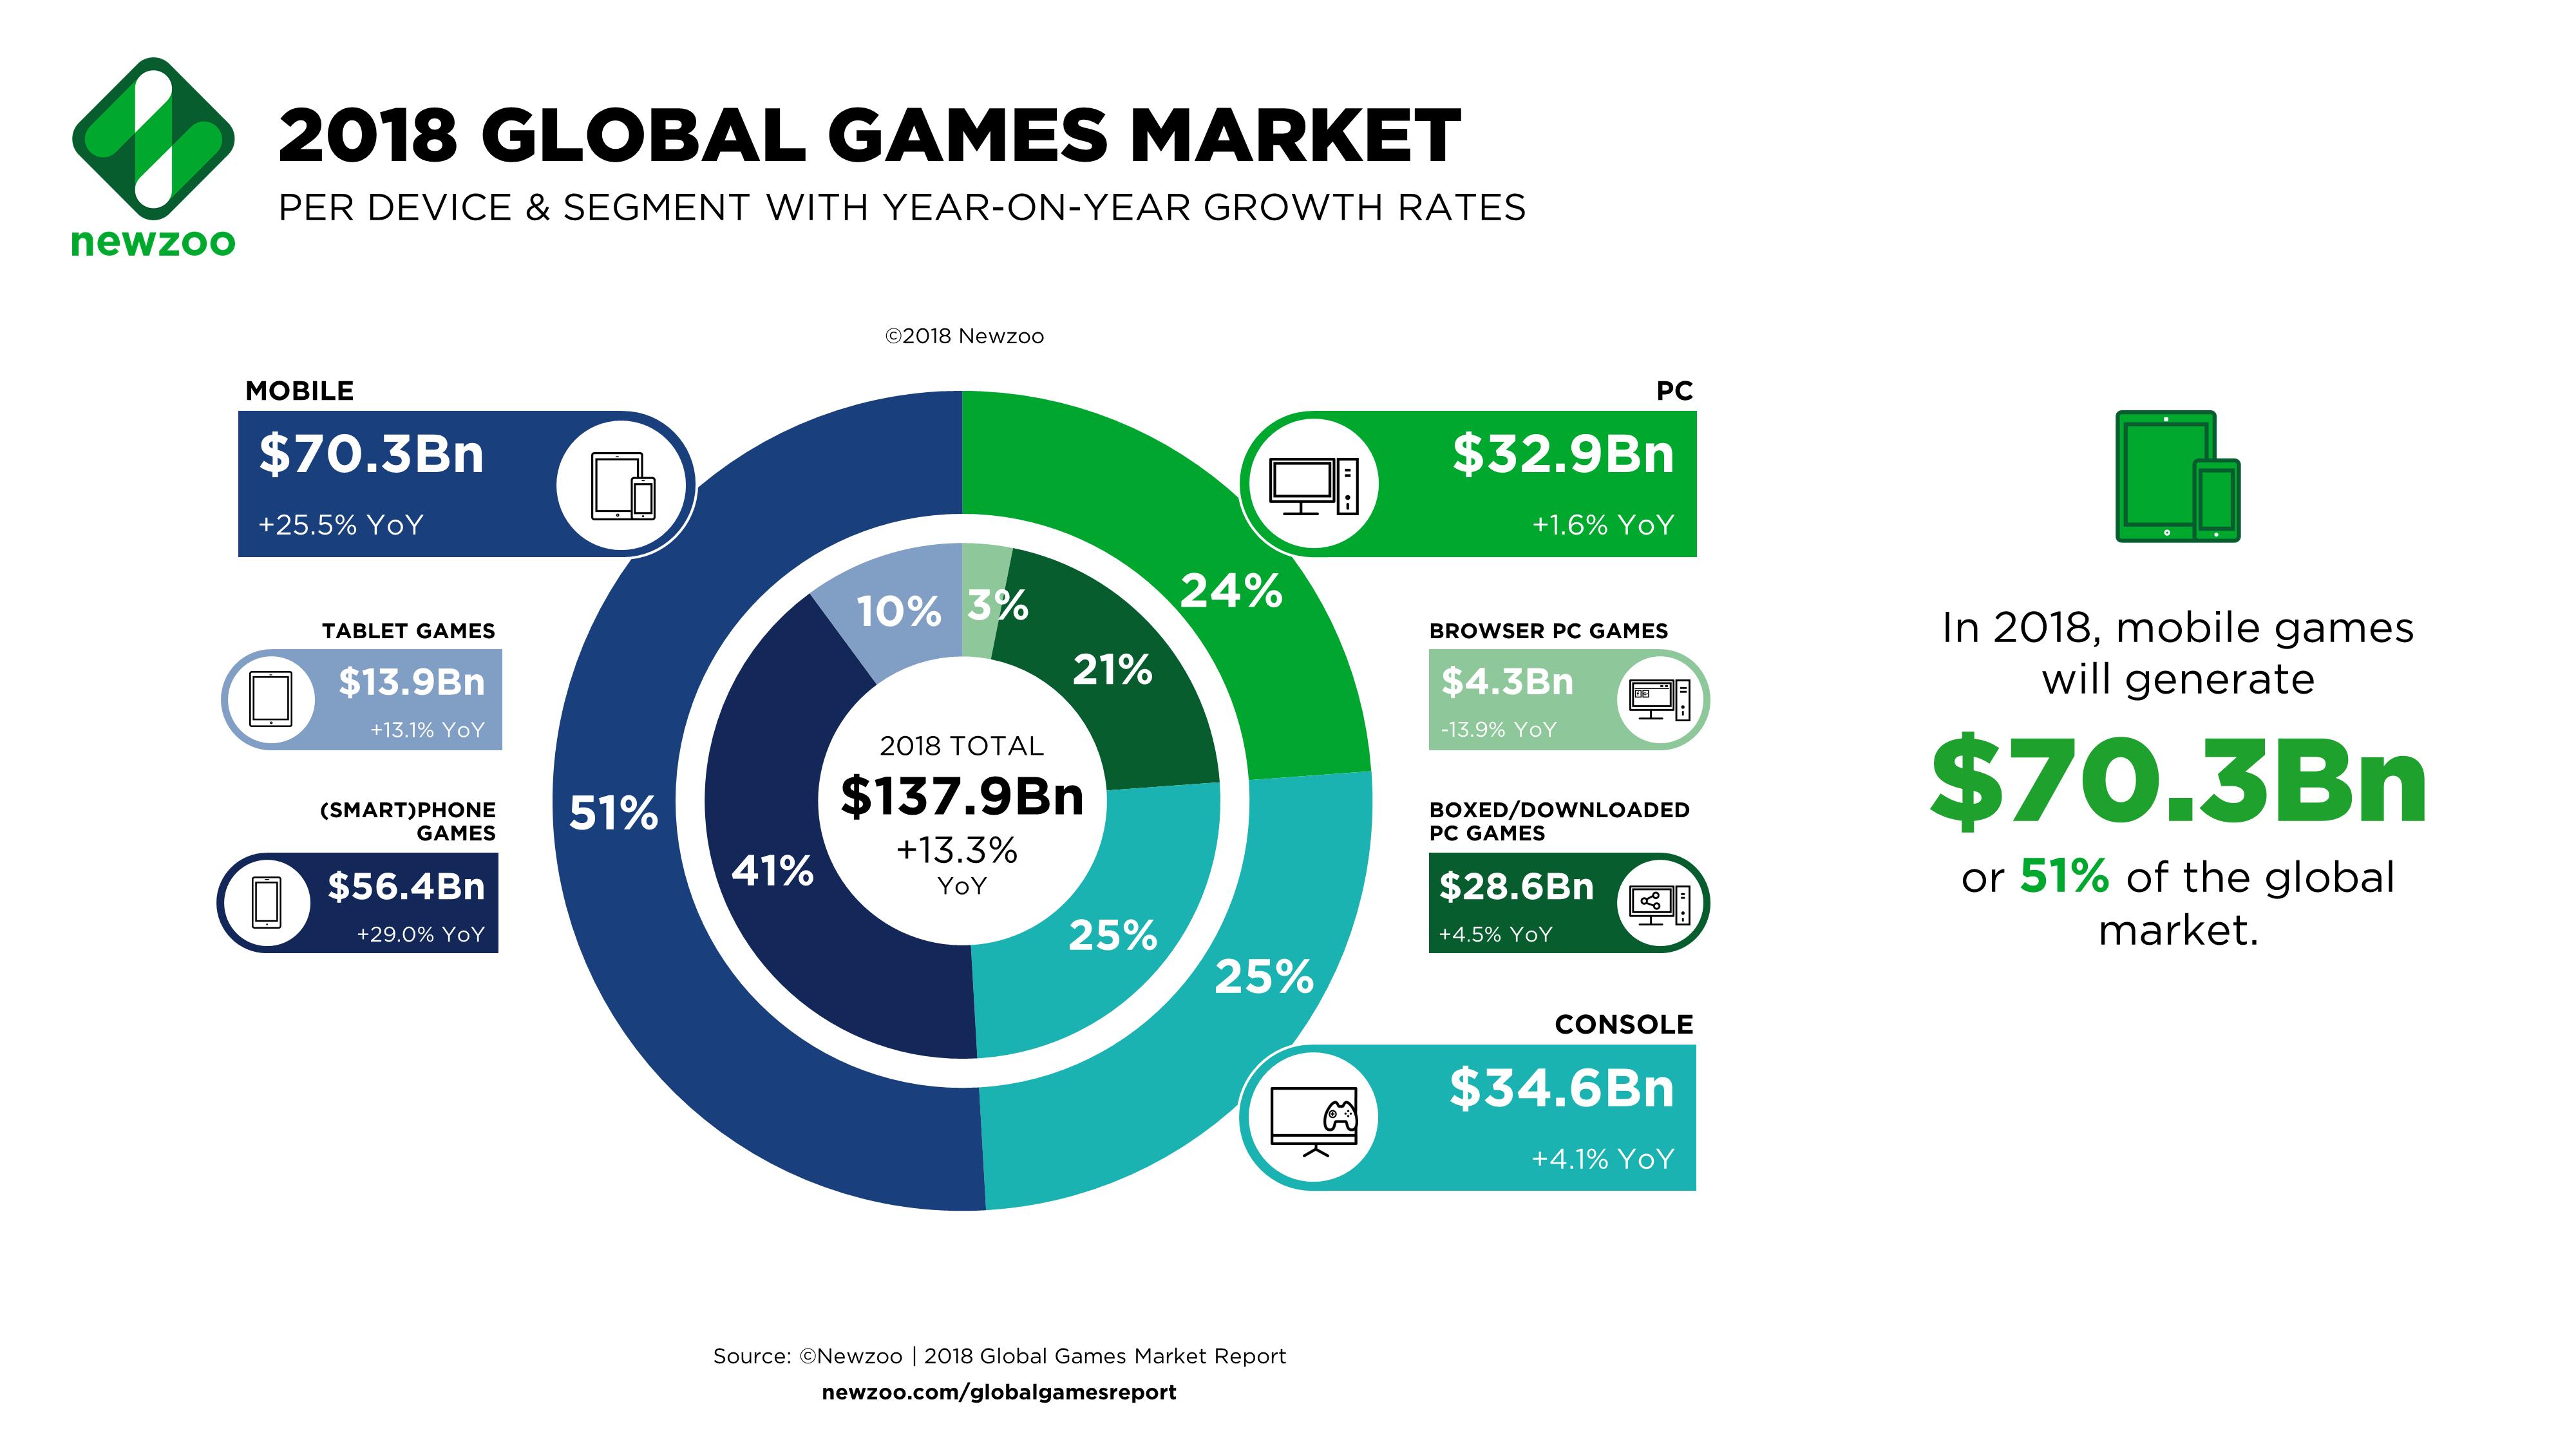 Activision Blizzard: It's A New Era